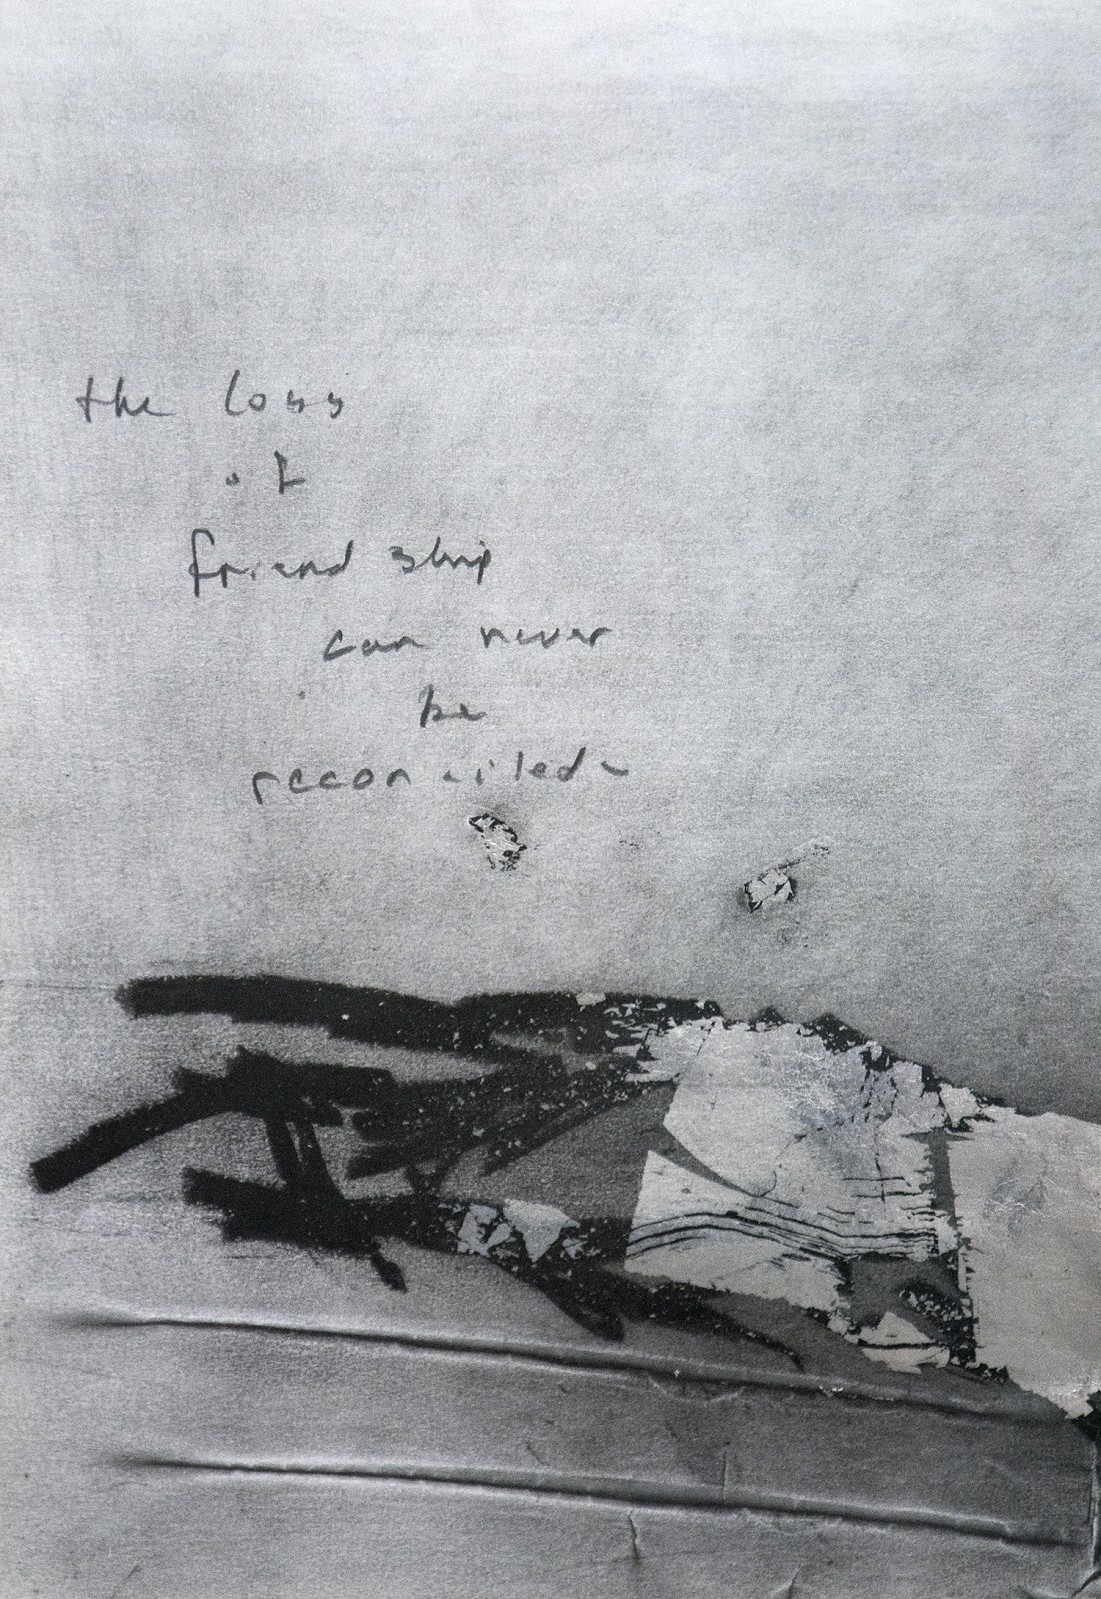 loss of friendship